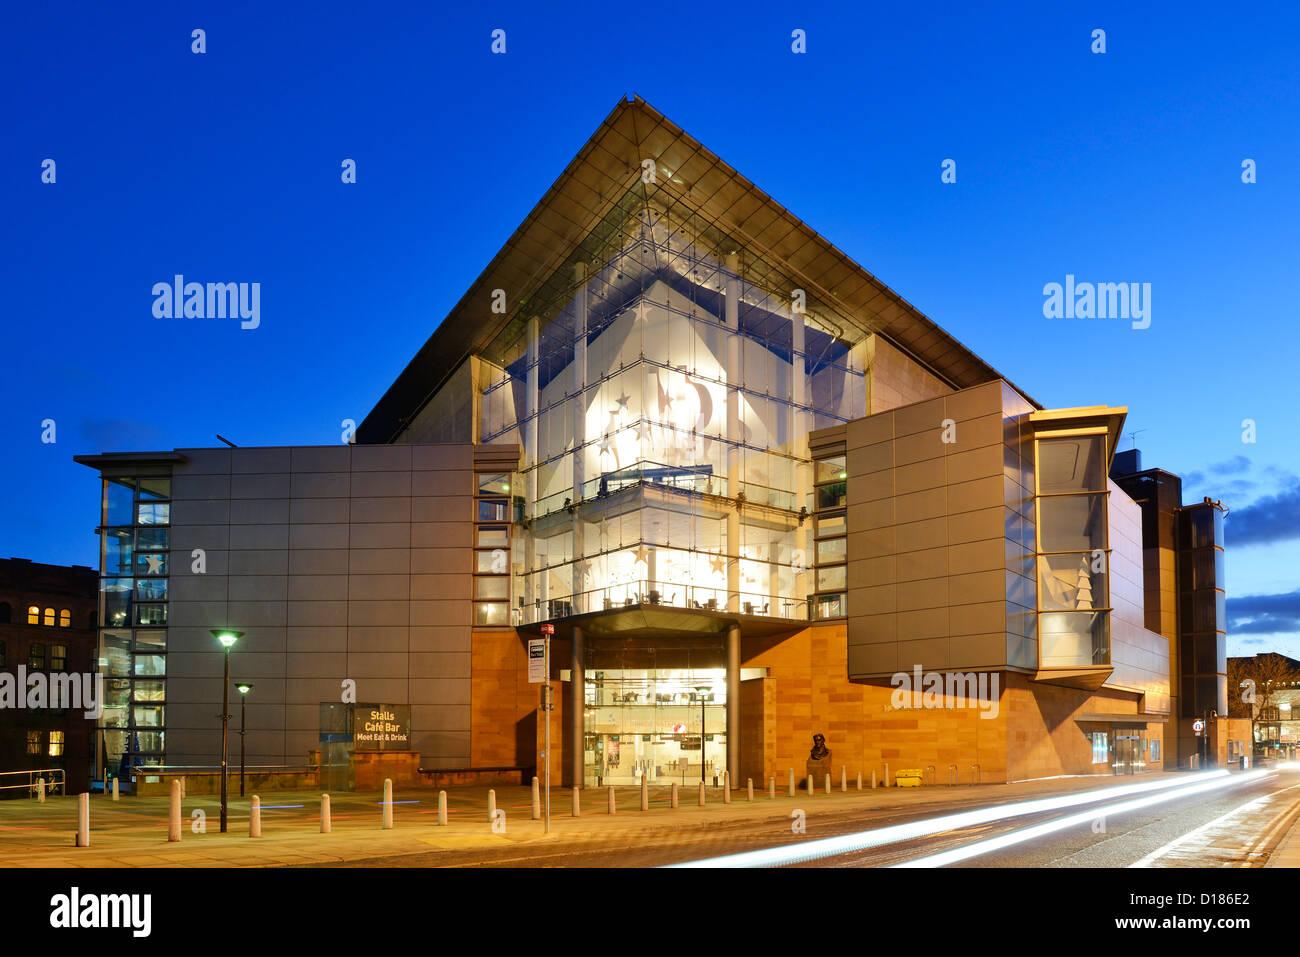 Bridgewater Hall Manchester City Centre at night - Stock Image